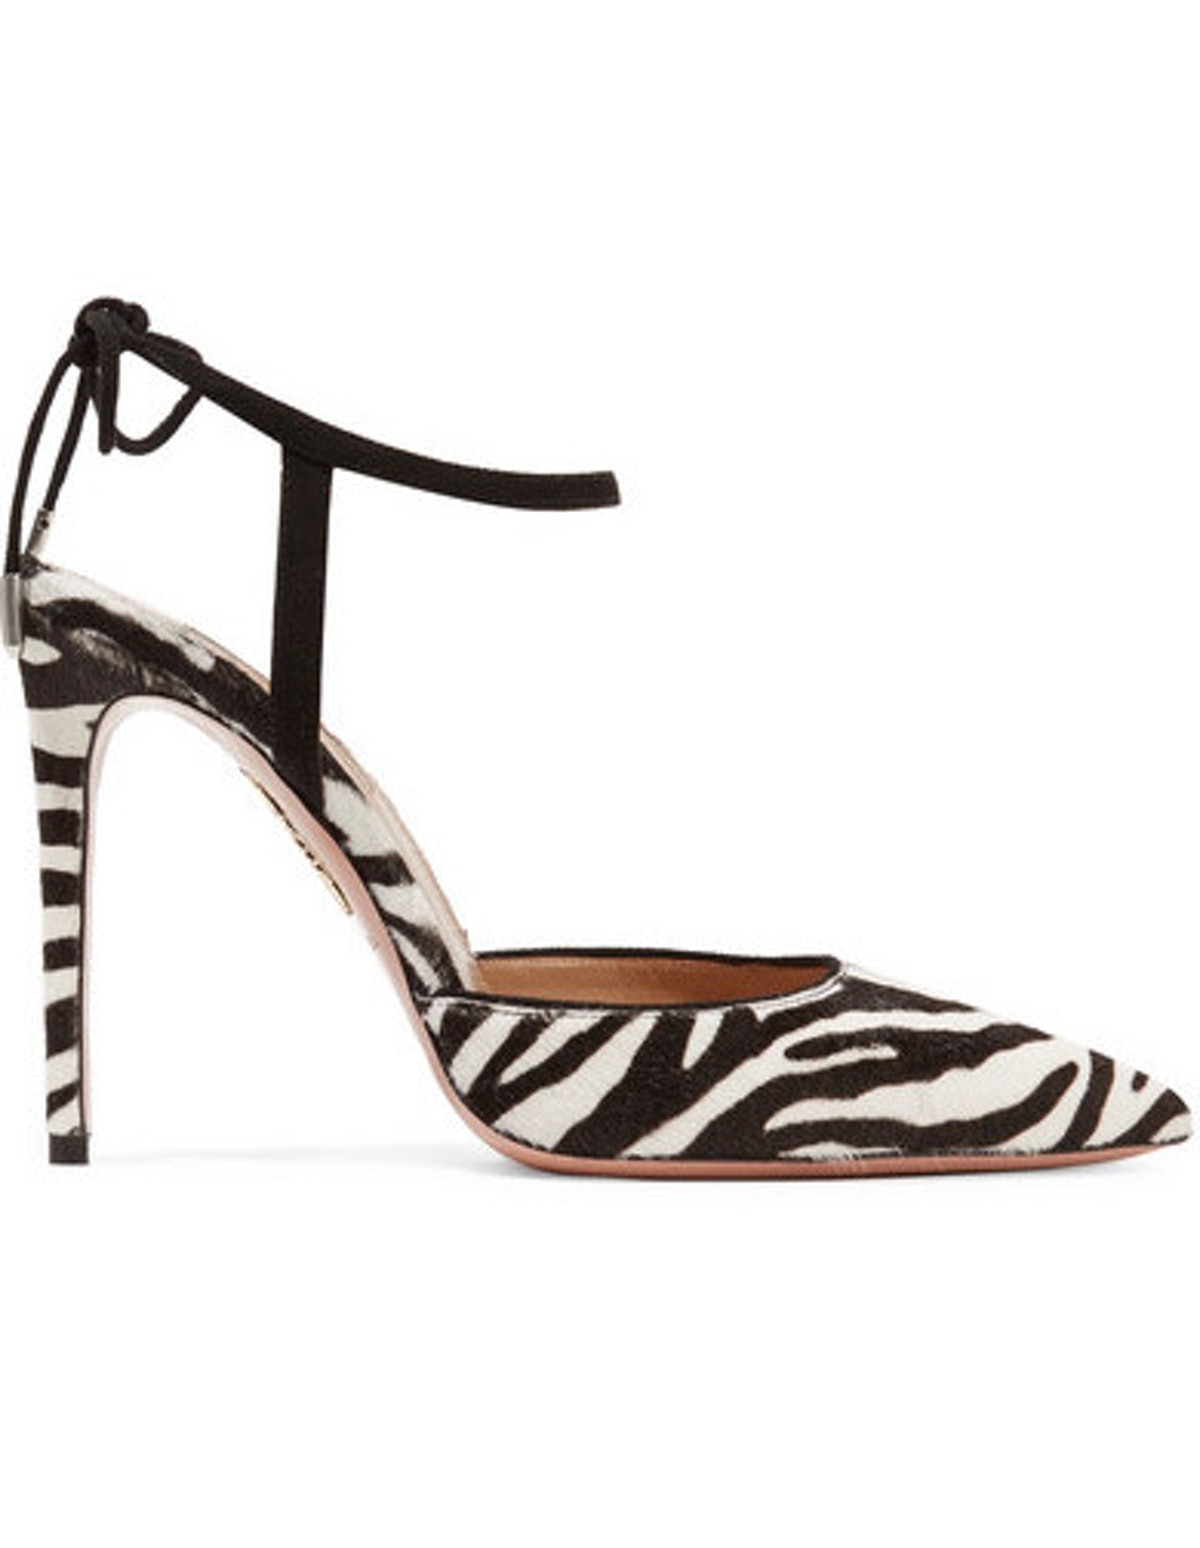 Candance Suede-Trimmed Zebra Print Calf Hair Pumps